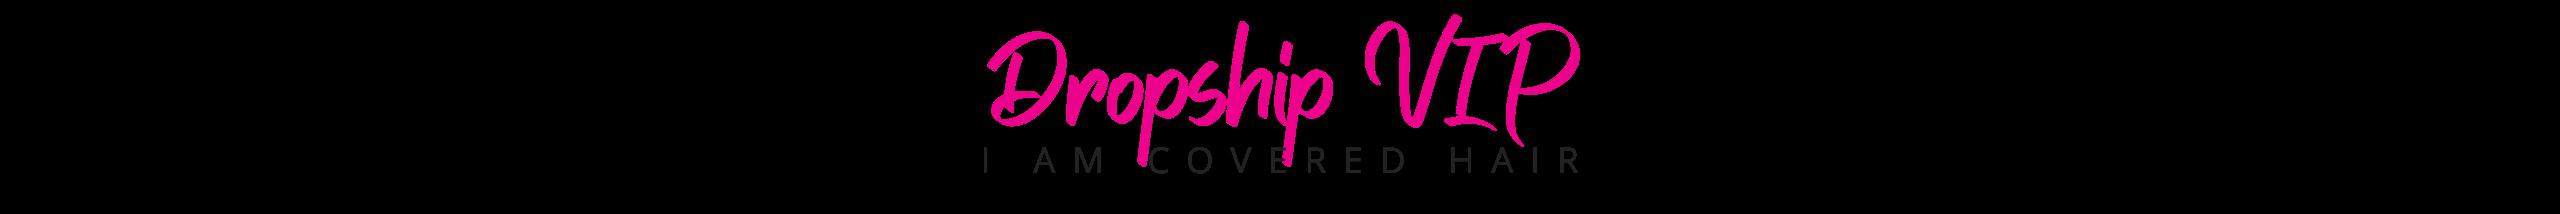 Dropship VIP Program